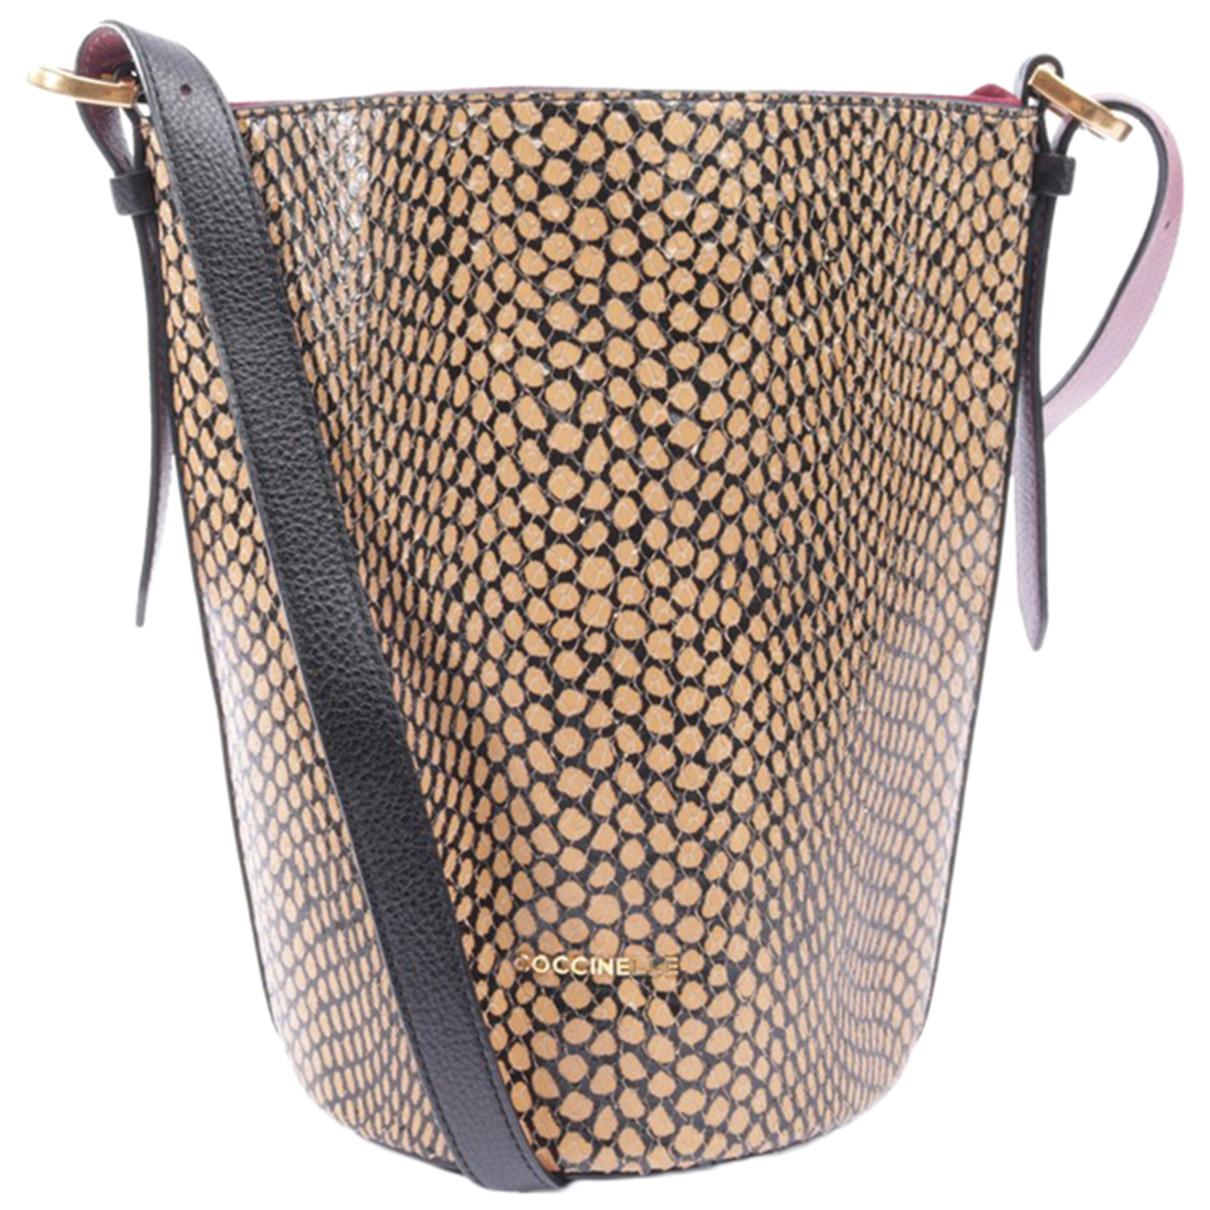 Coccinelle \N Multicolour Leather handbag for Women \N